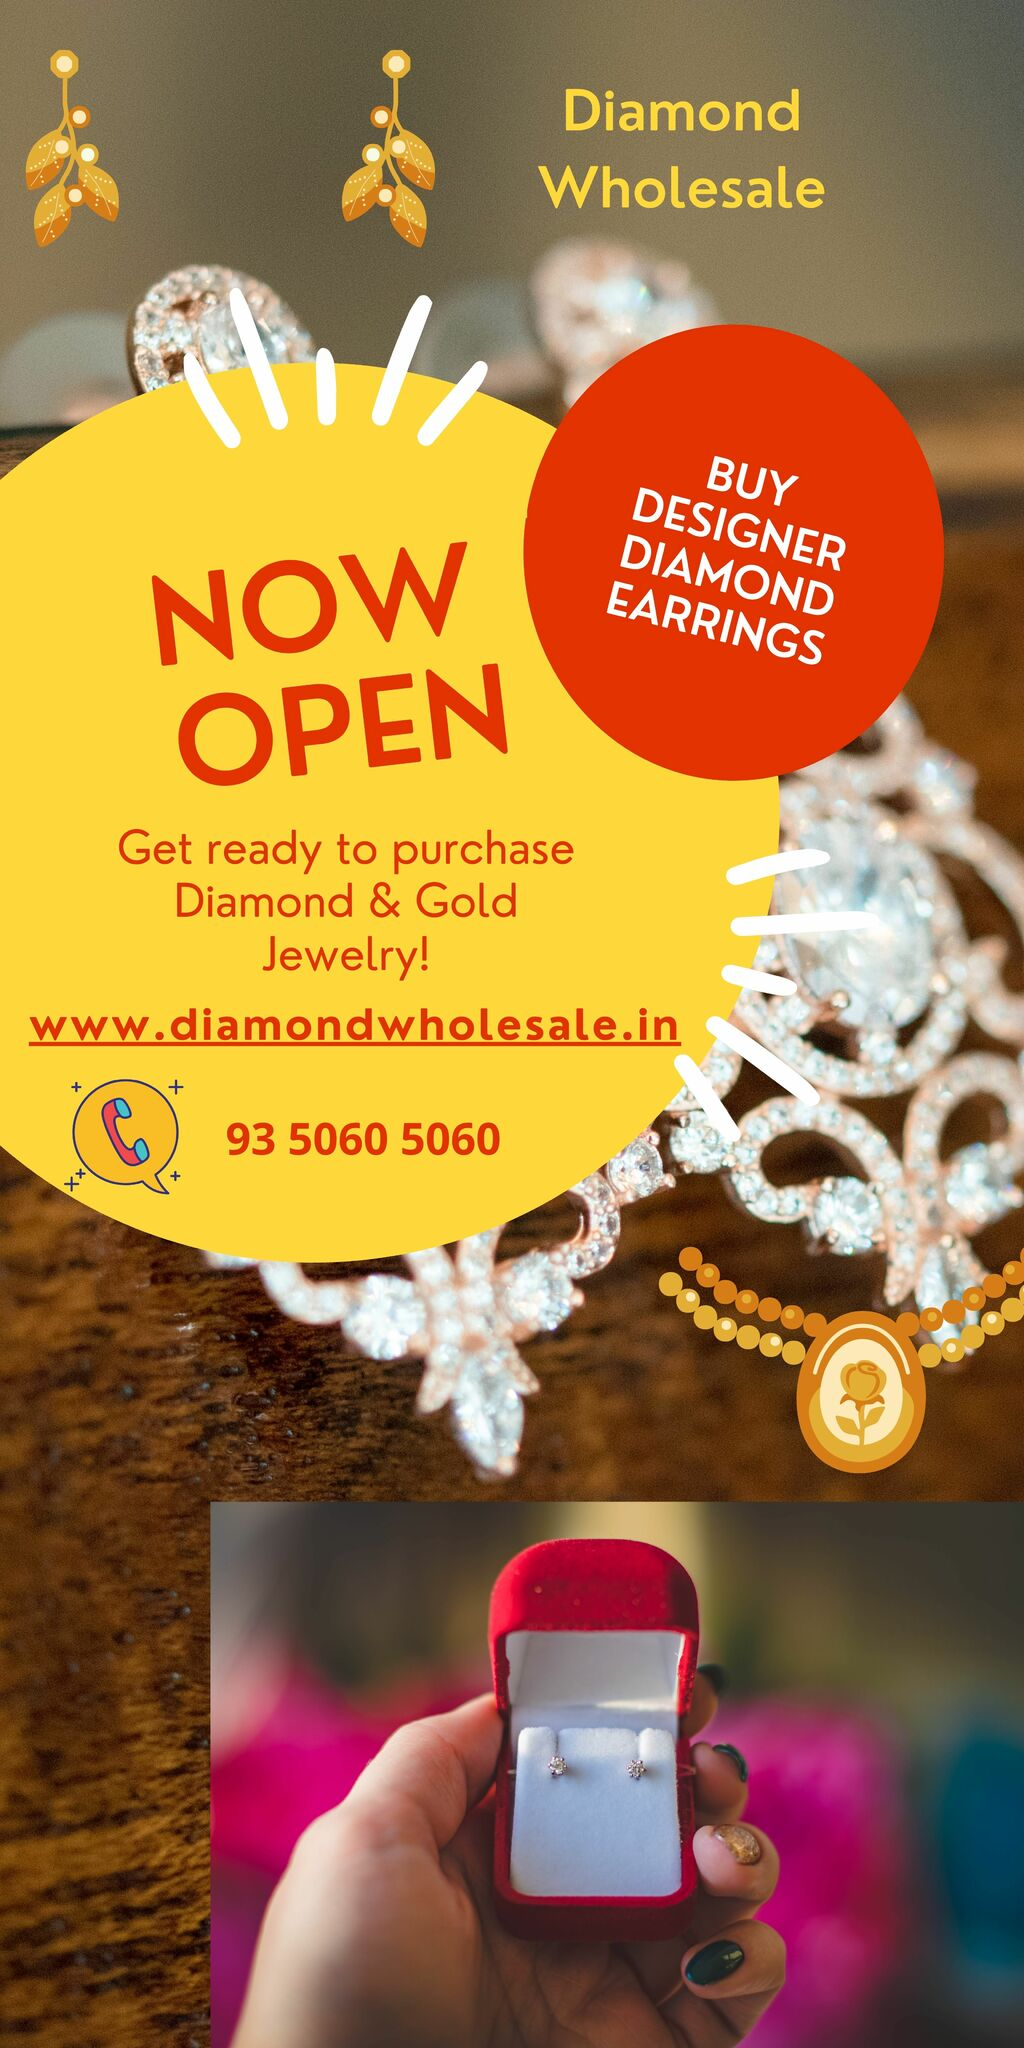 Book Diamond Earrings online via Diamond Wholesale